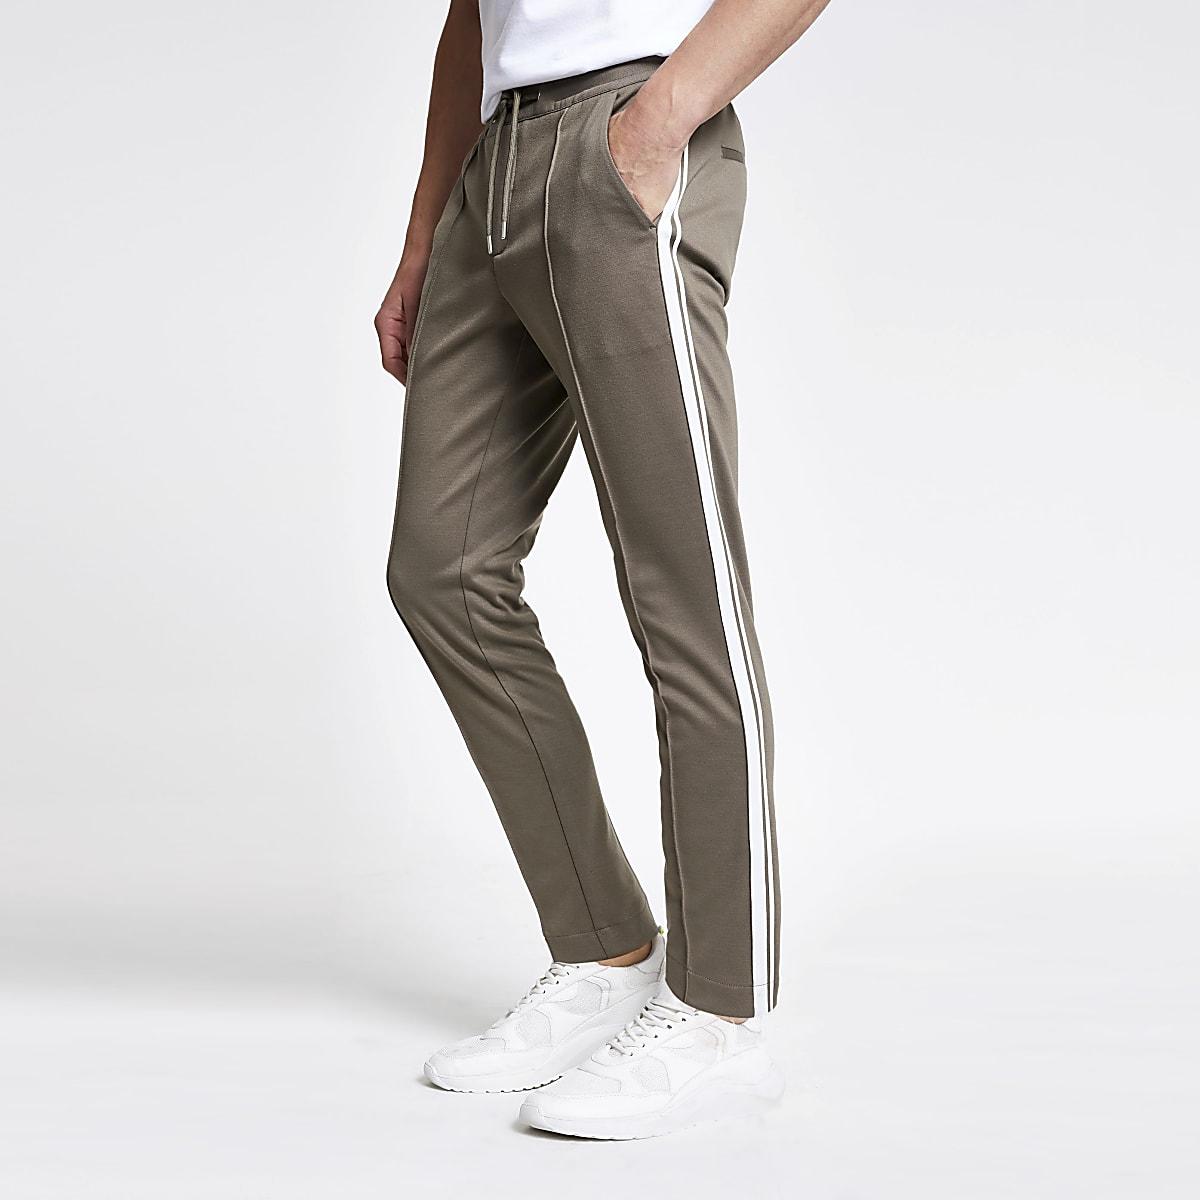 Light green skinny tape pants